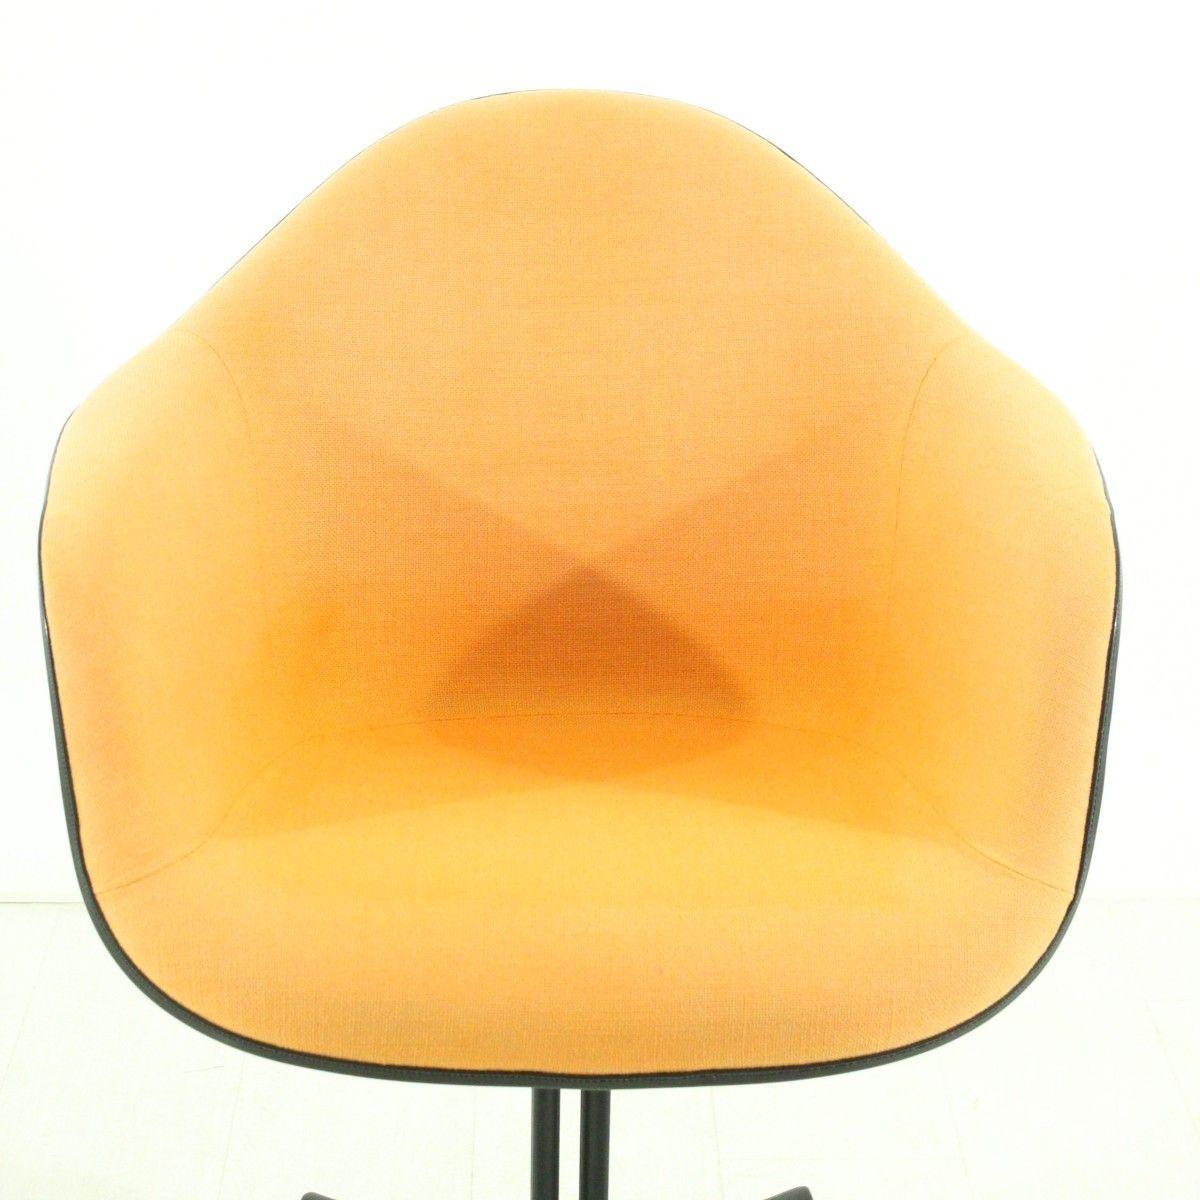 Chaise terracotta la fonda vintage par charles ray eames for Chaise eames vitra soldes